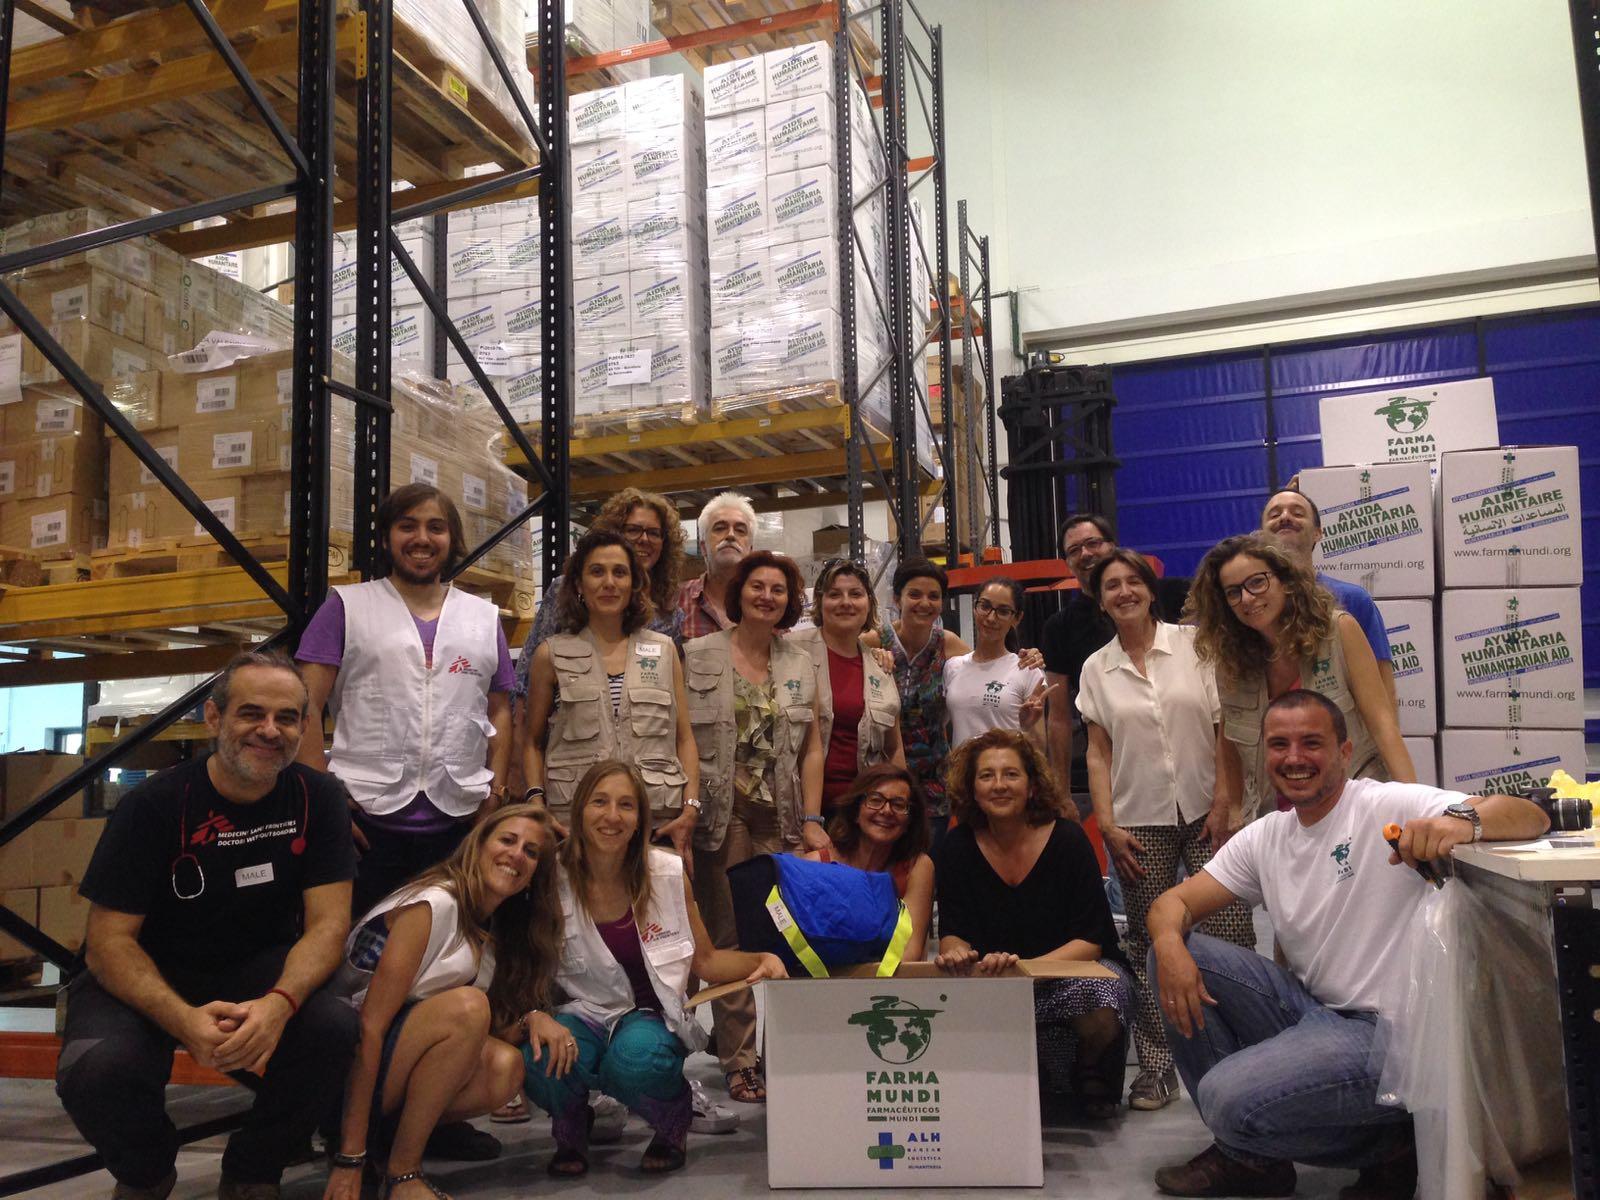 Suministramos 400 kits de rescate a MSF para aprovisionar el Aquarius